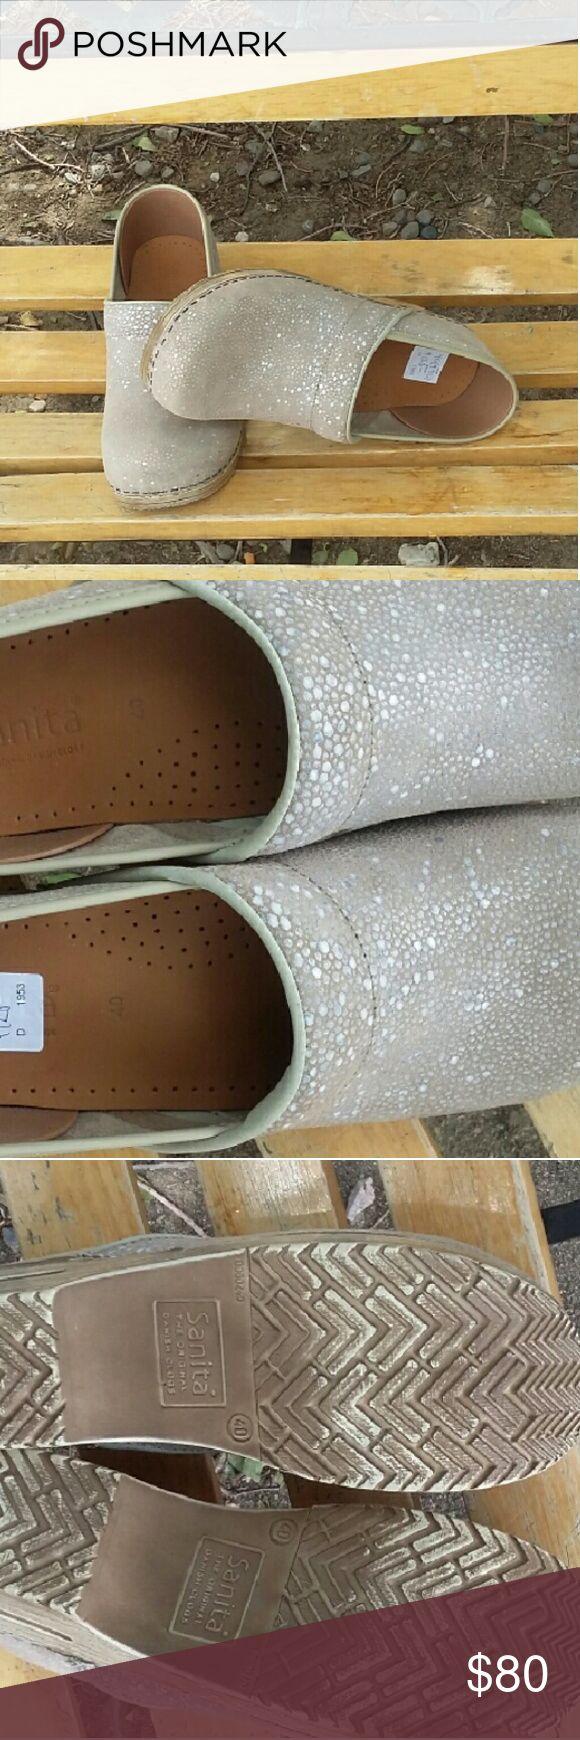 SALE OUR TRADE NURSING CLOGS SANITA DANISH CLOGS PROFESSIONAL SIZE 40 sanita Shoes Mules & Clogs